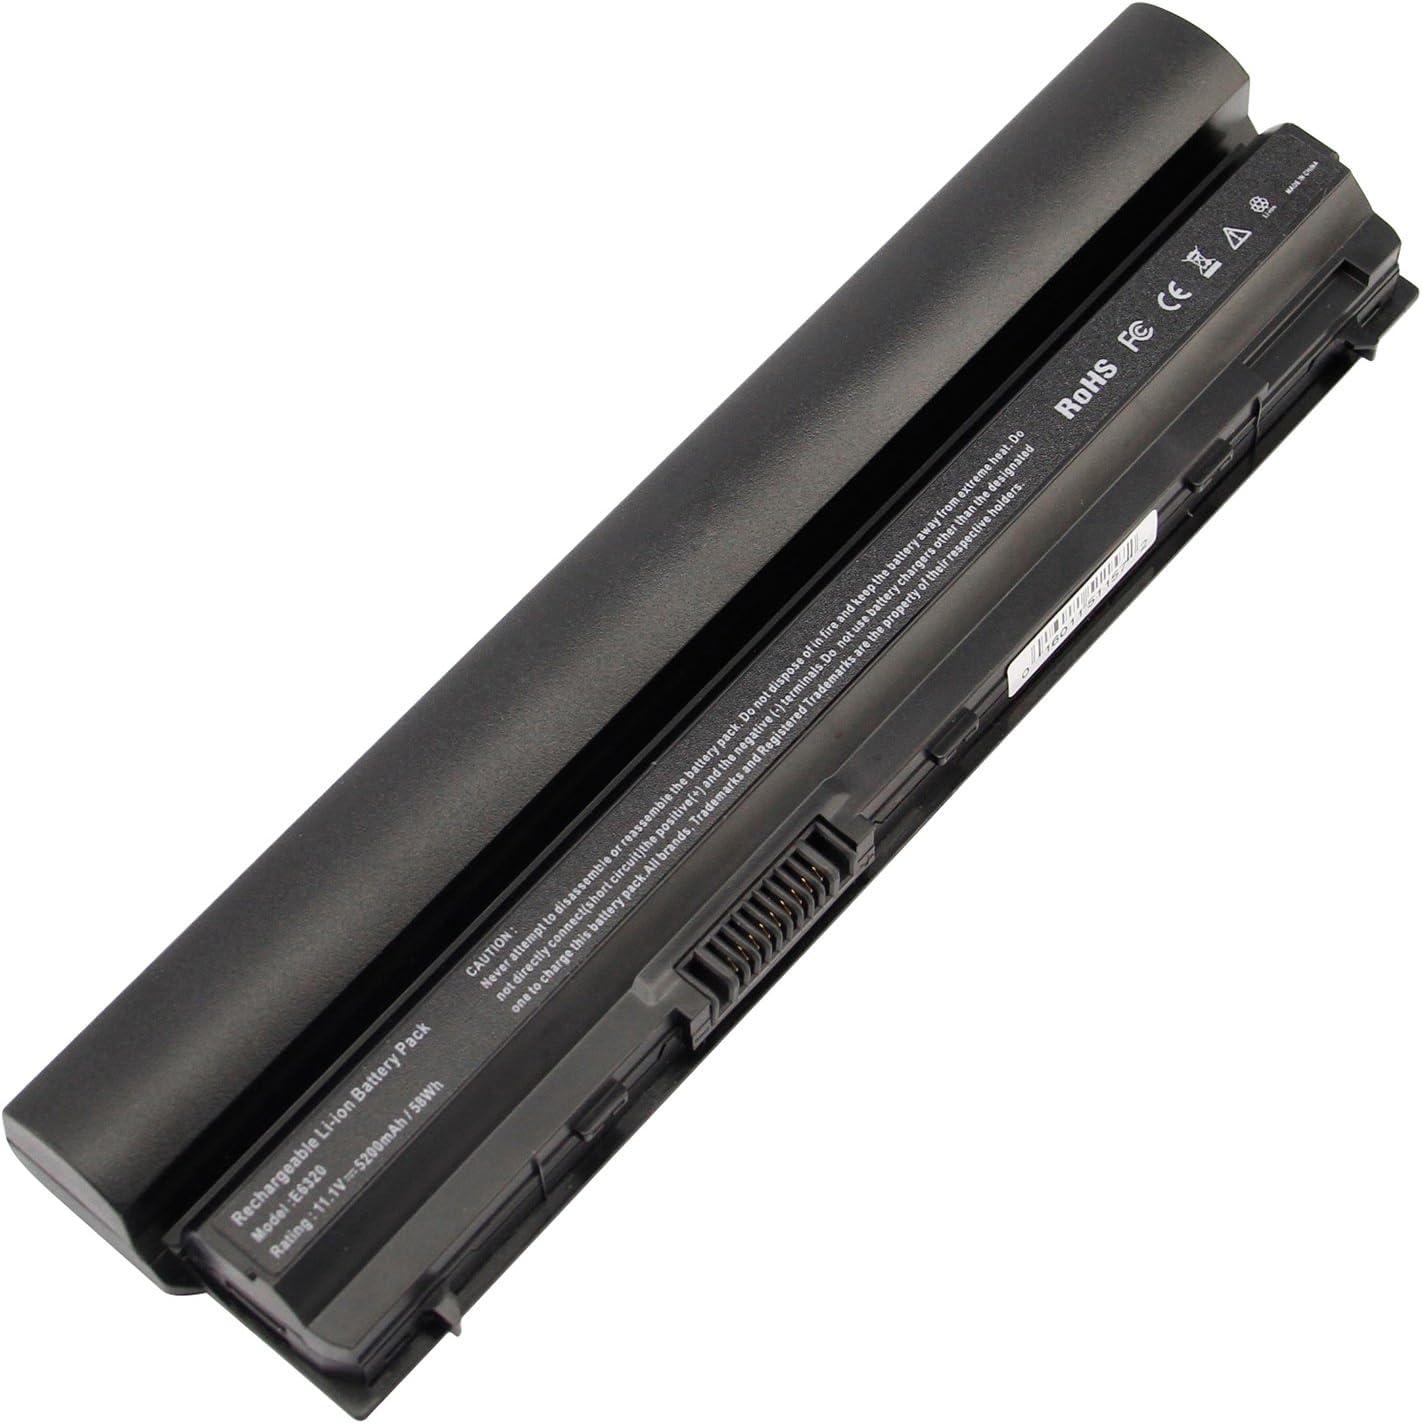 Futurebatt Performance Laptop Battery Replacement for Dell Latitude E6120 E6220 E6230 E6320 E6320xfr E6330 E6430s Series, p/n 312-1241 312-1242 FRROG [Li-ion 11.1v 5200mah]-18 Months Warranty